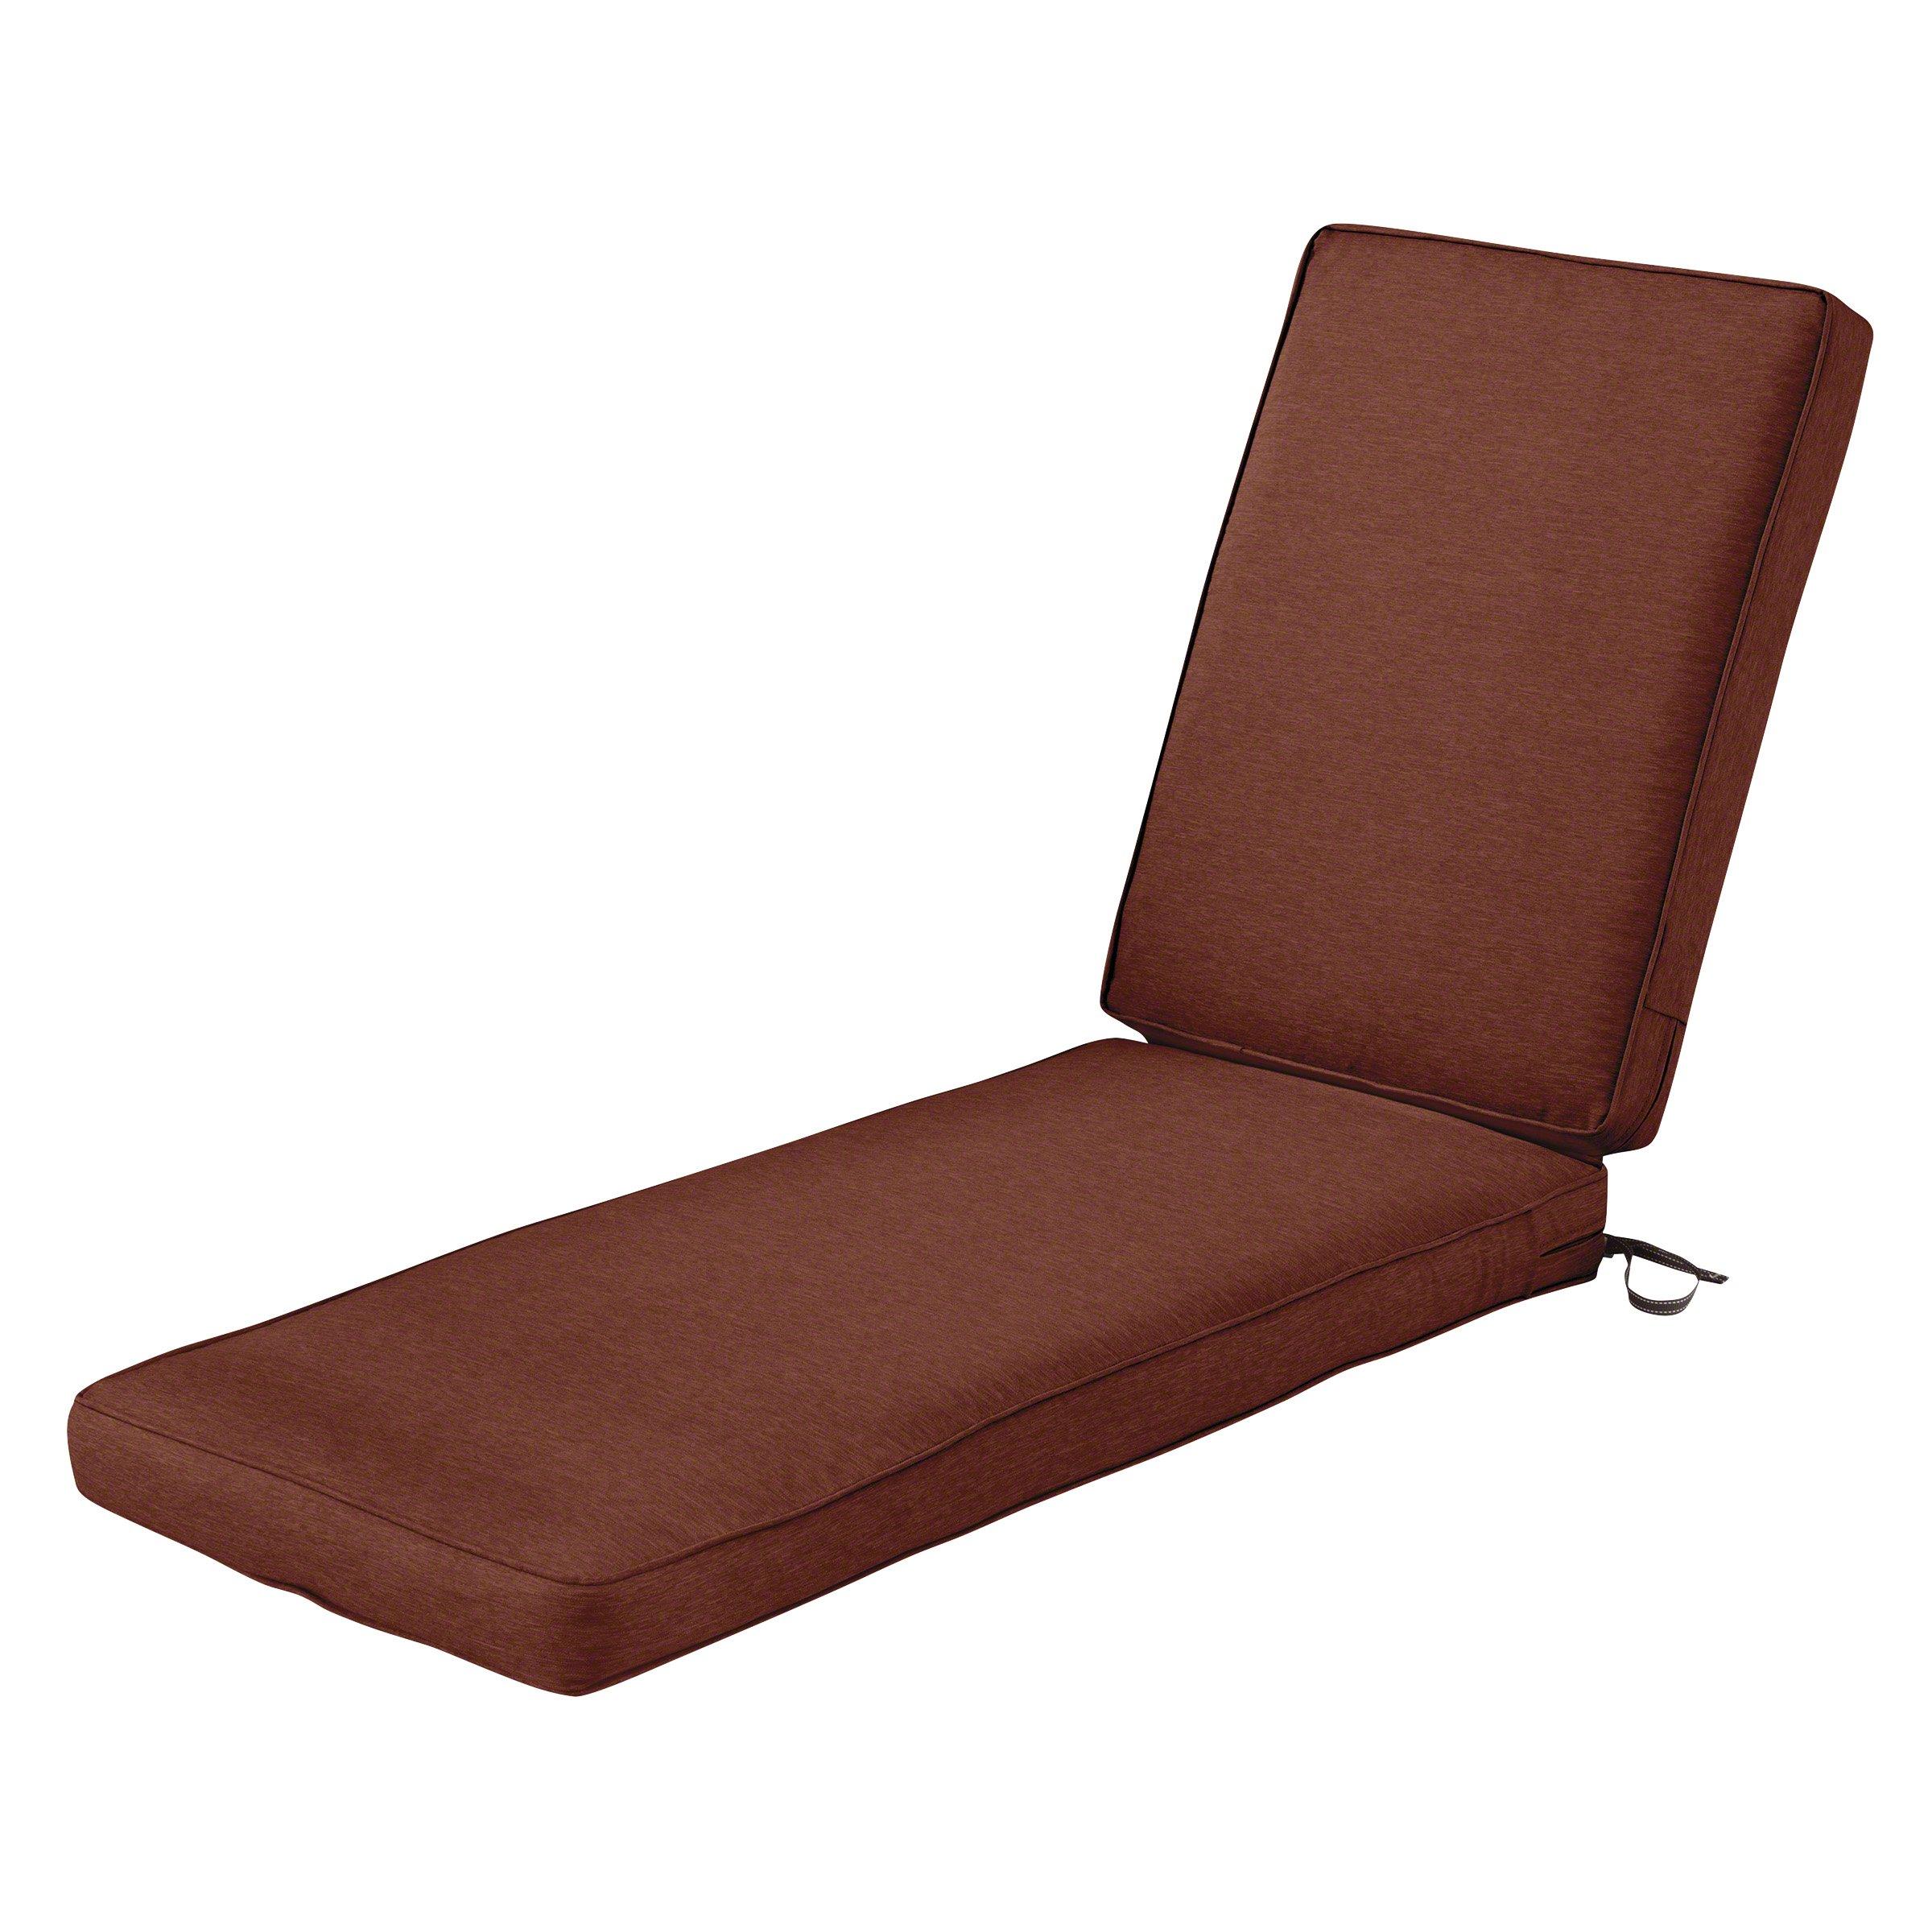 Classic Accessories Montlake Chaise Cushion Foam & Slip Cover, Heather Henna, 72x21x3'' Thick